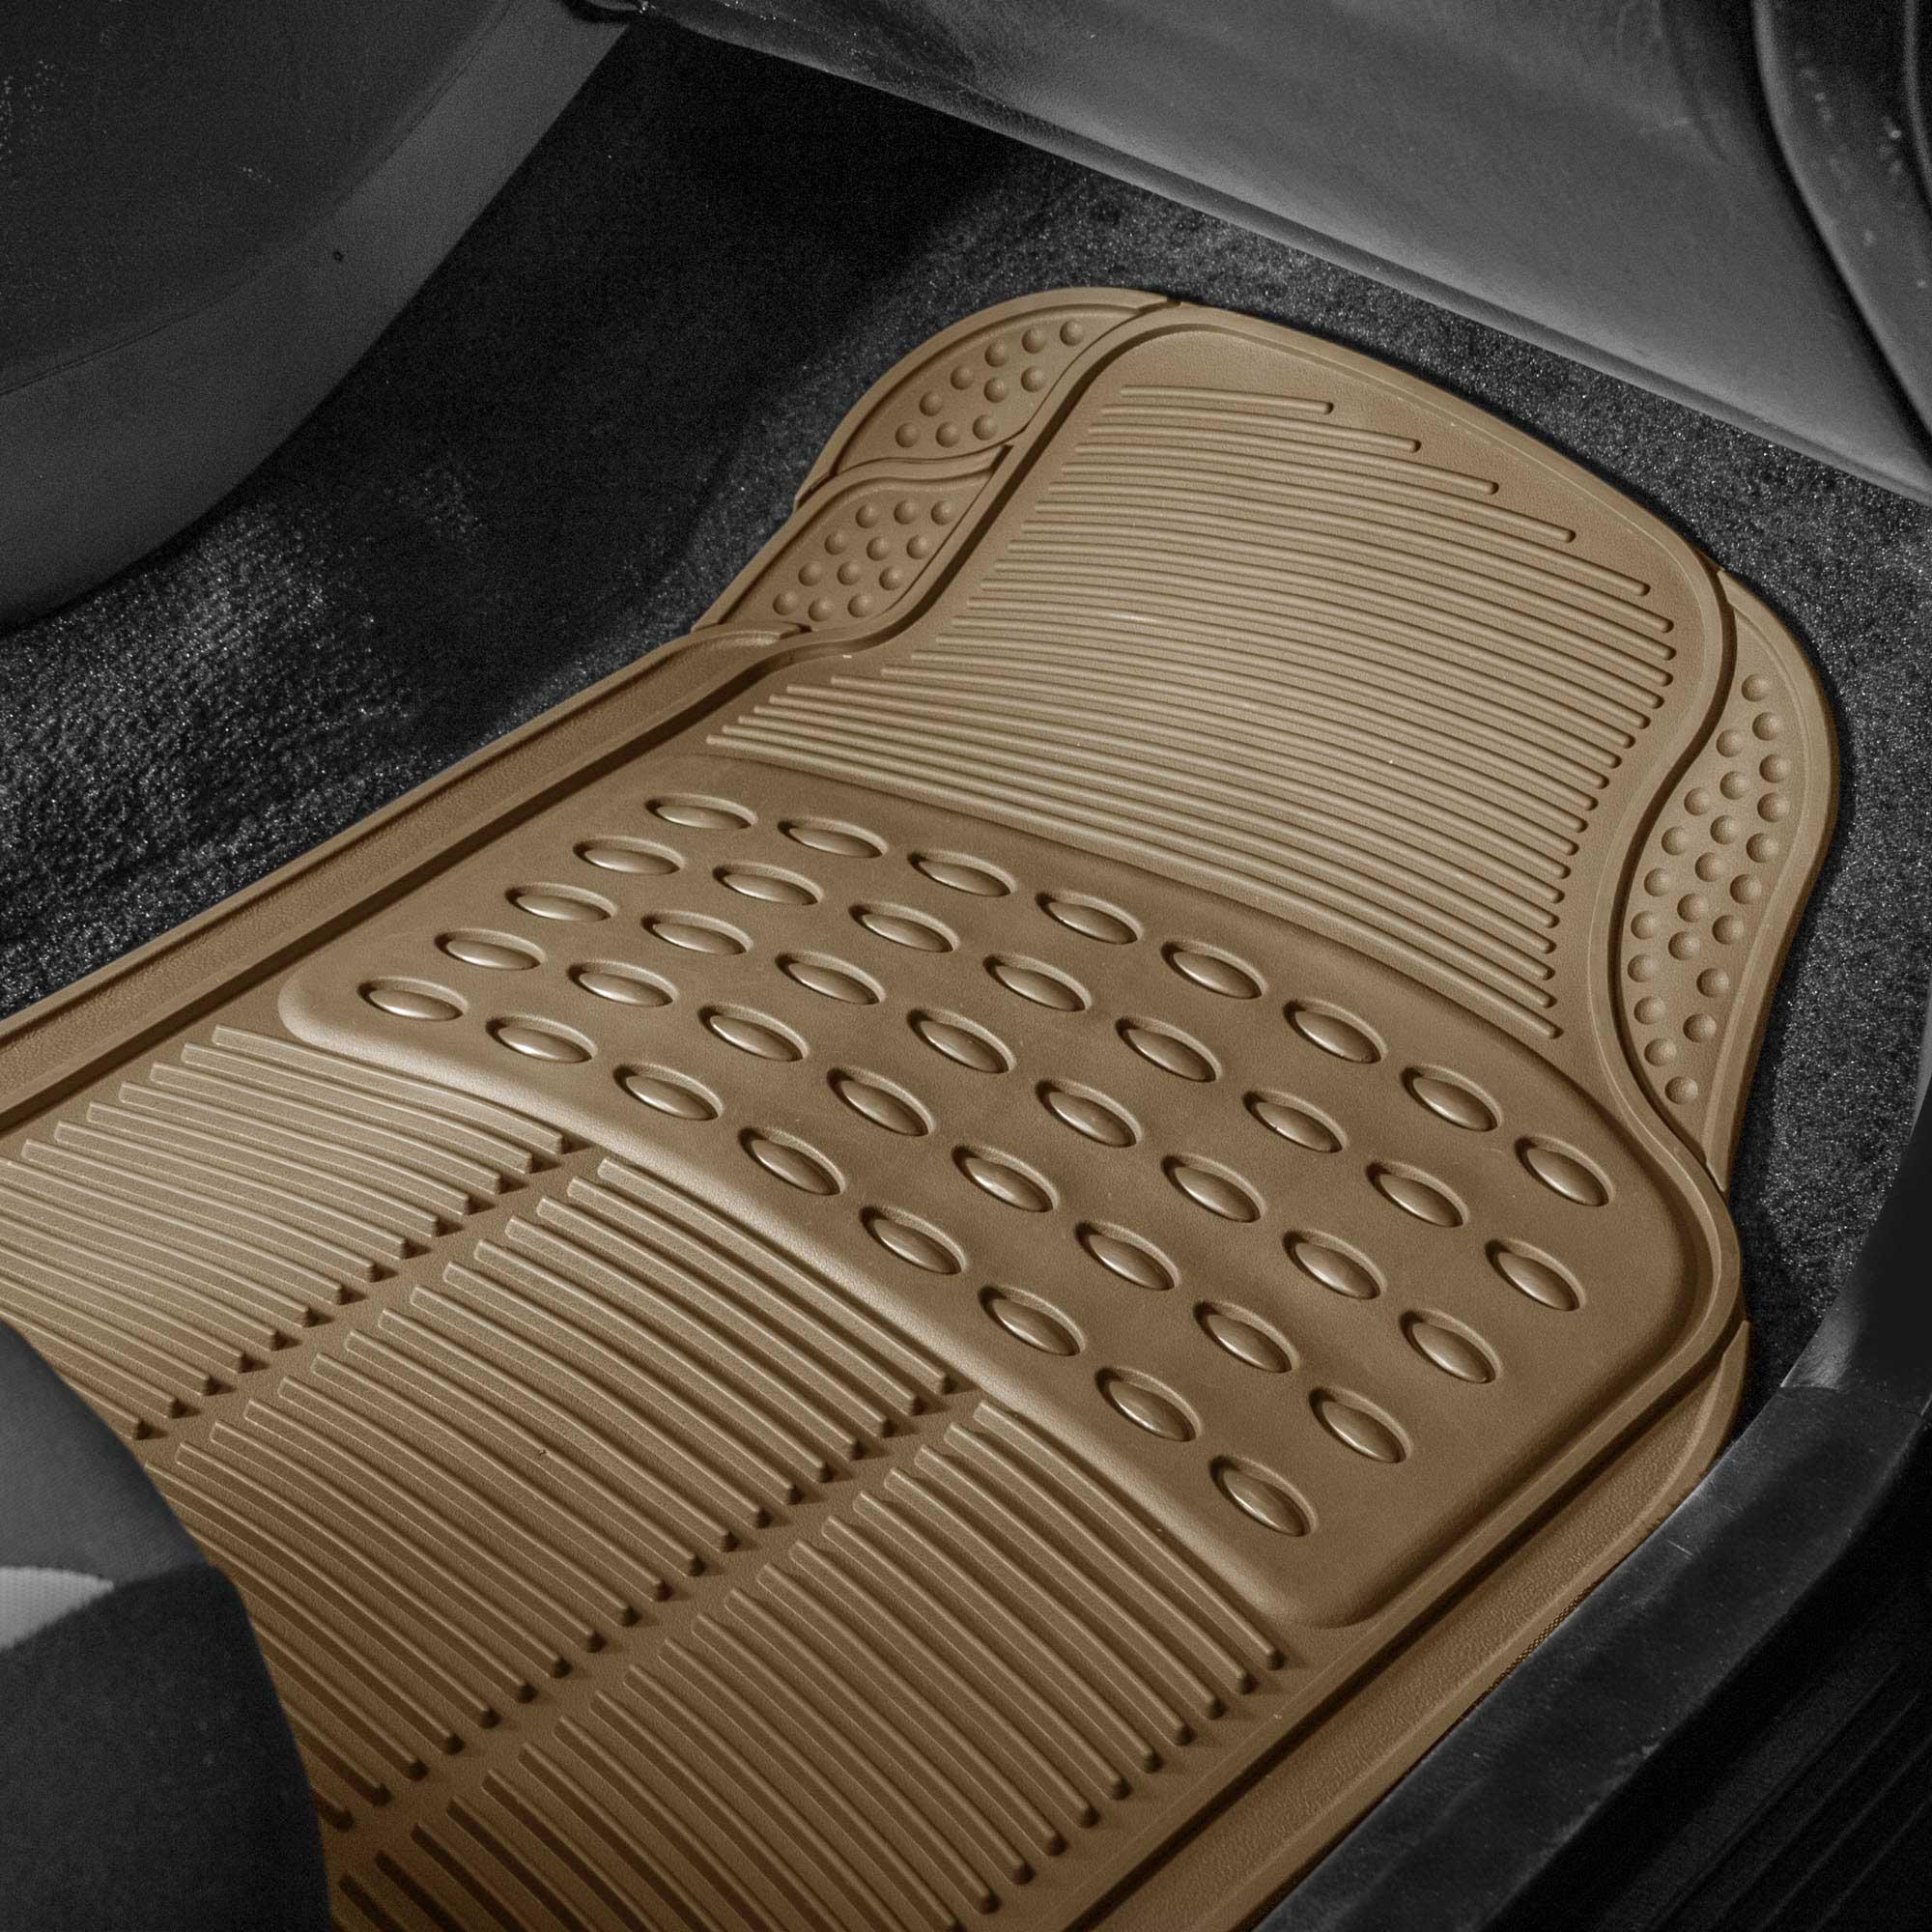 3pc-Floor-Mats-for-Auto-Car-SUV-Van-Heavy-Duty-3-Colors-w-Free-Gift thumbnail 6